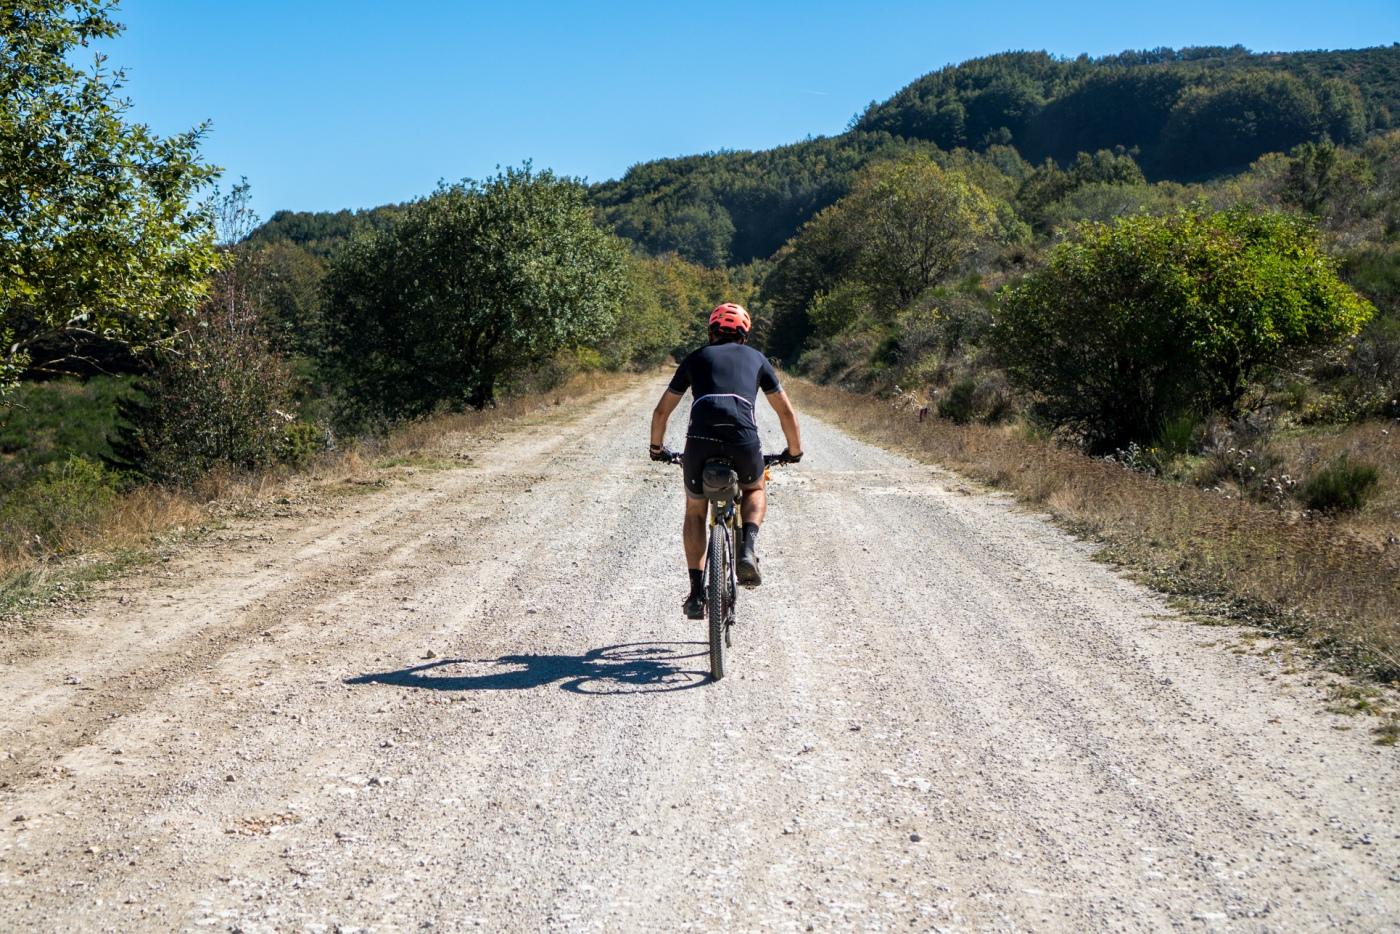 pratomagno_bikepacking-39